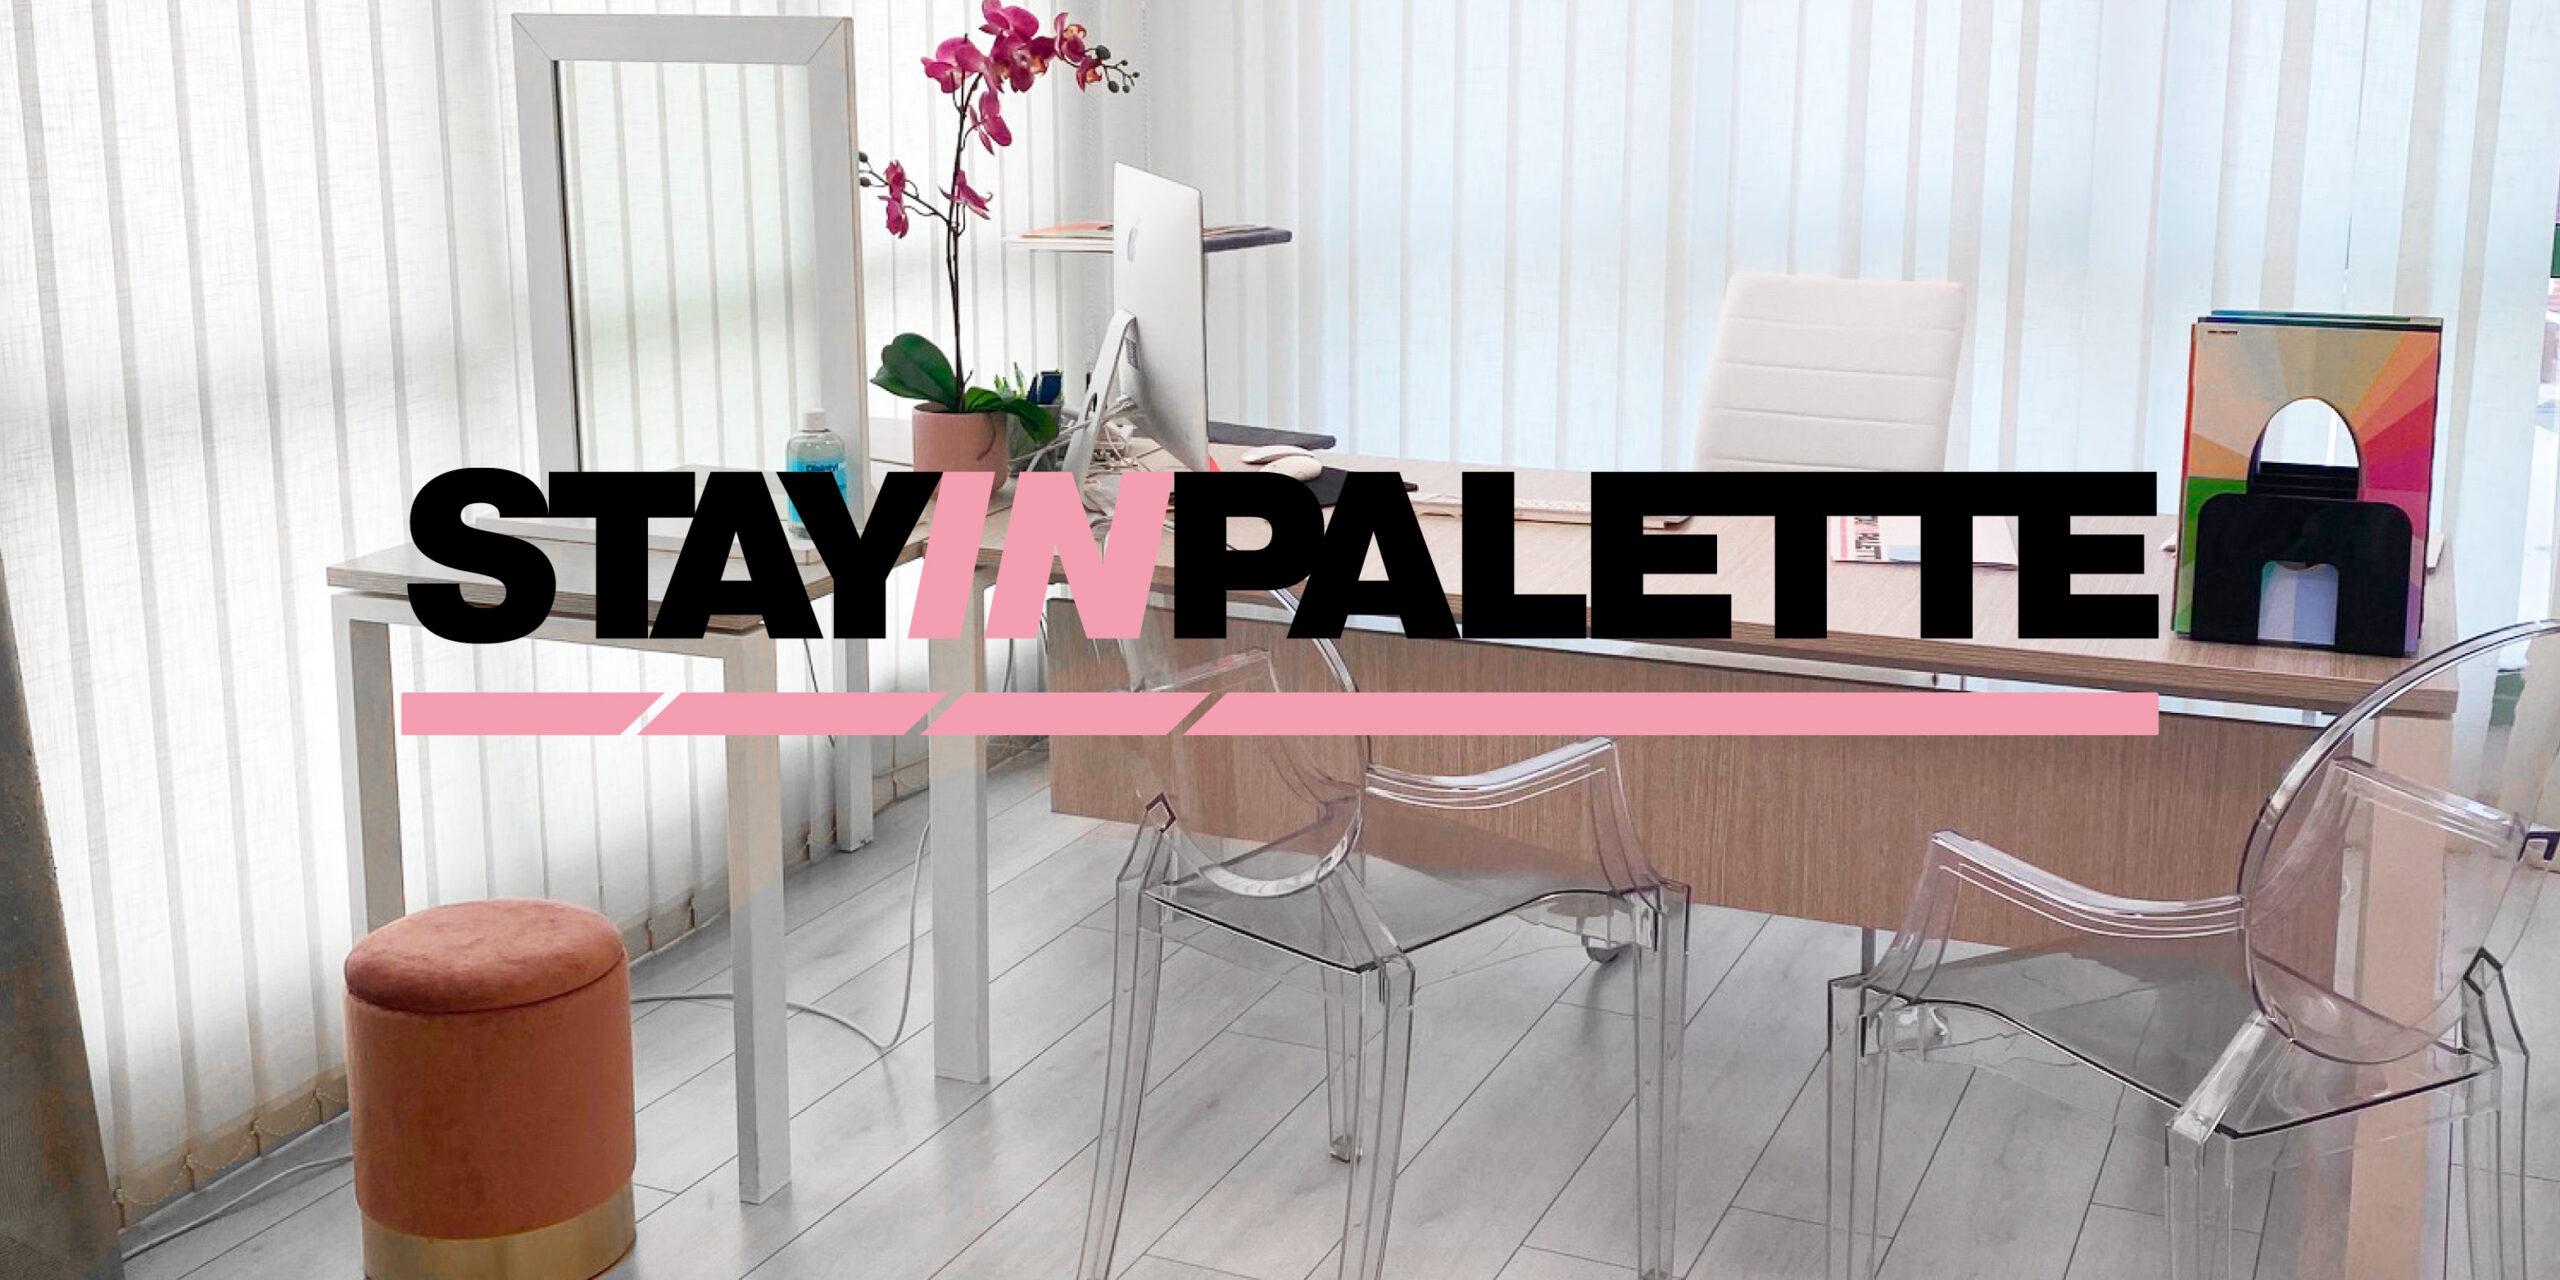 Studio Stayinpalette Firenze